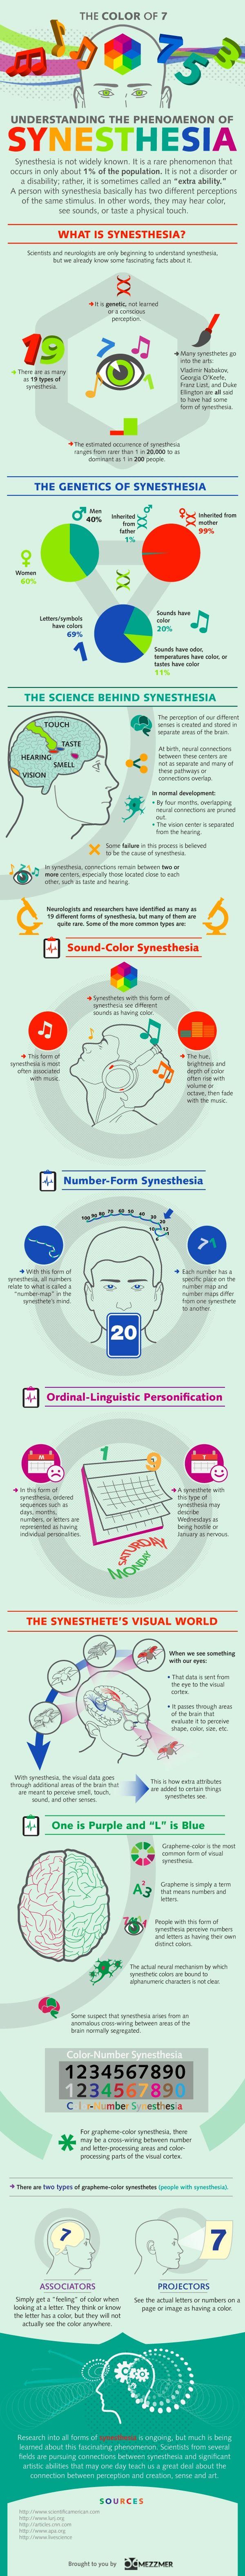 Understanding The Phenomenon Of Synesthesia [Infographic] - Data Visualization…